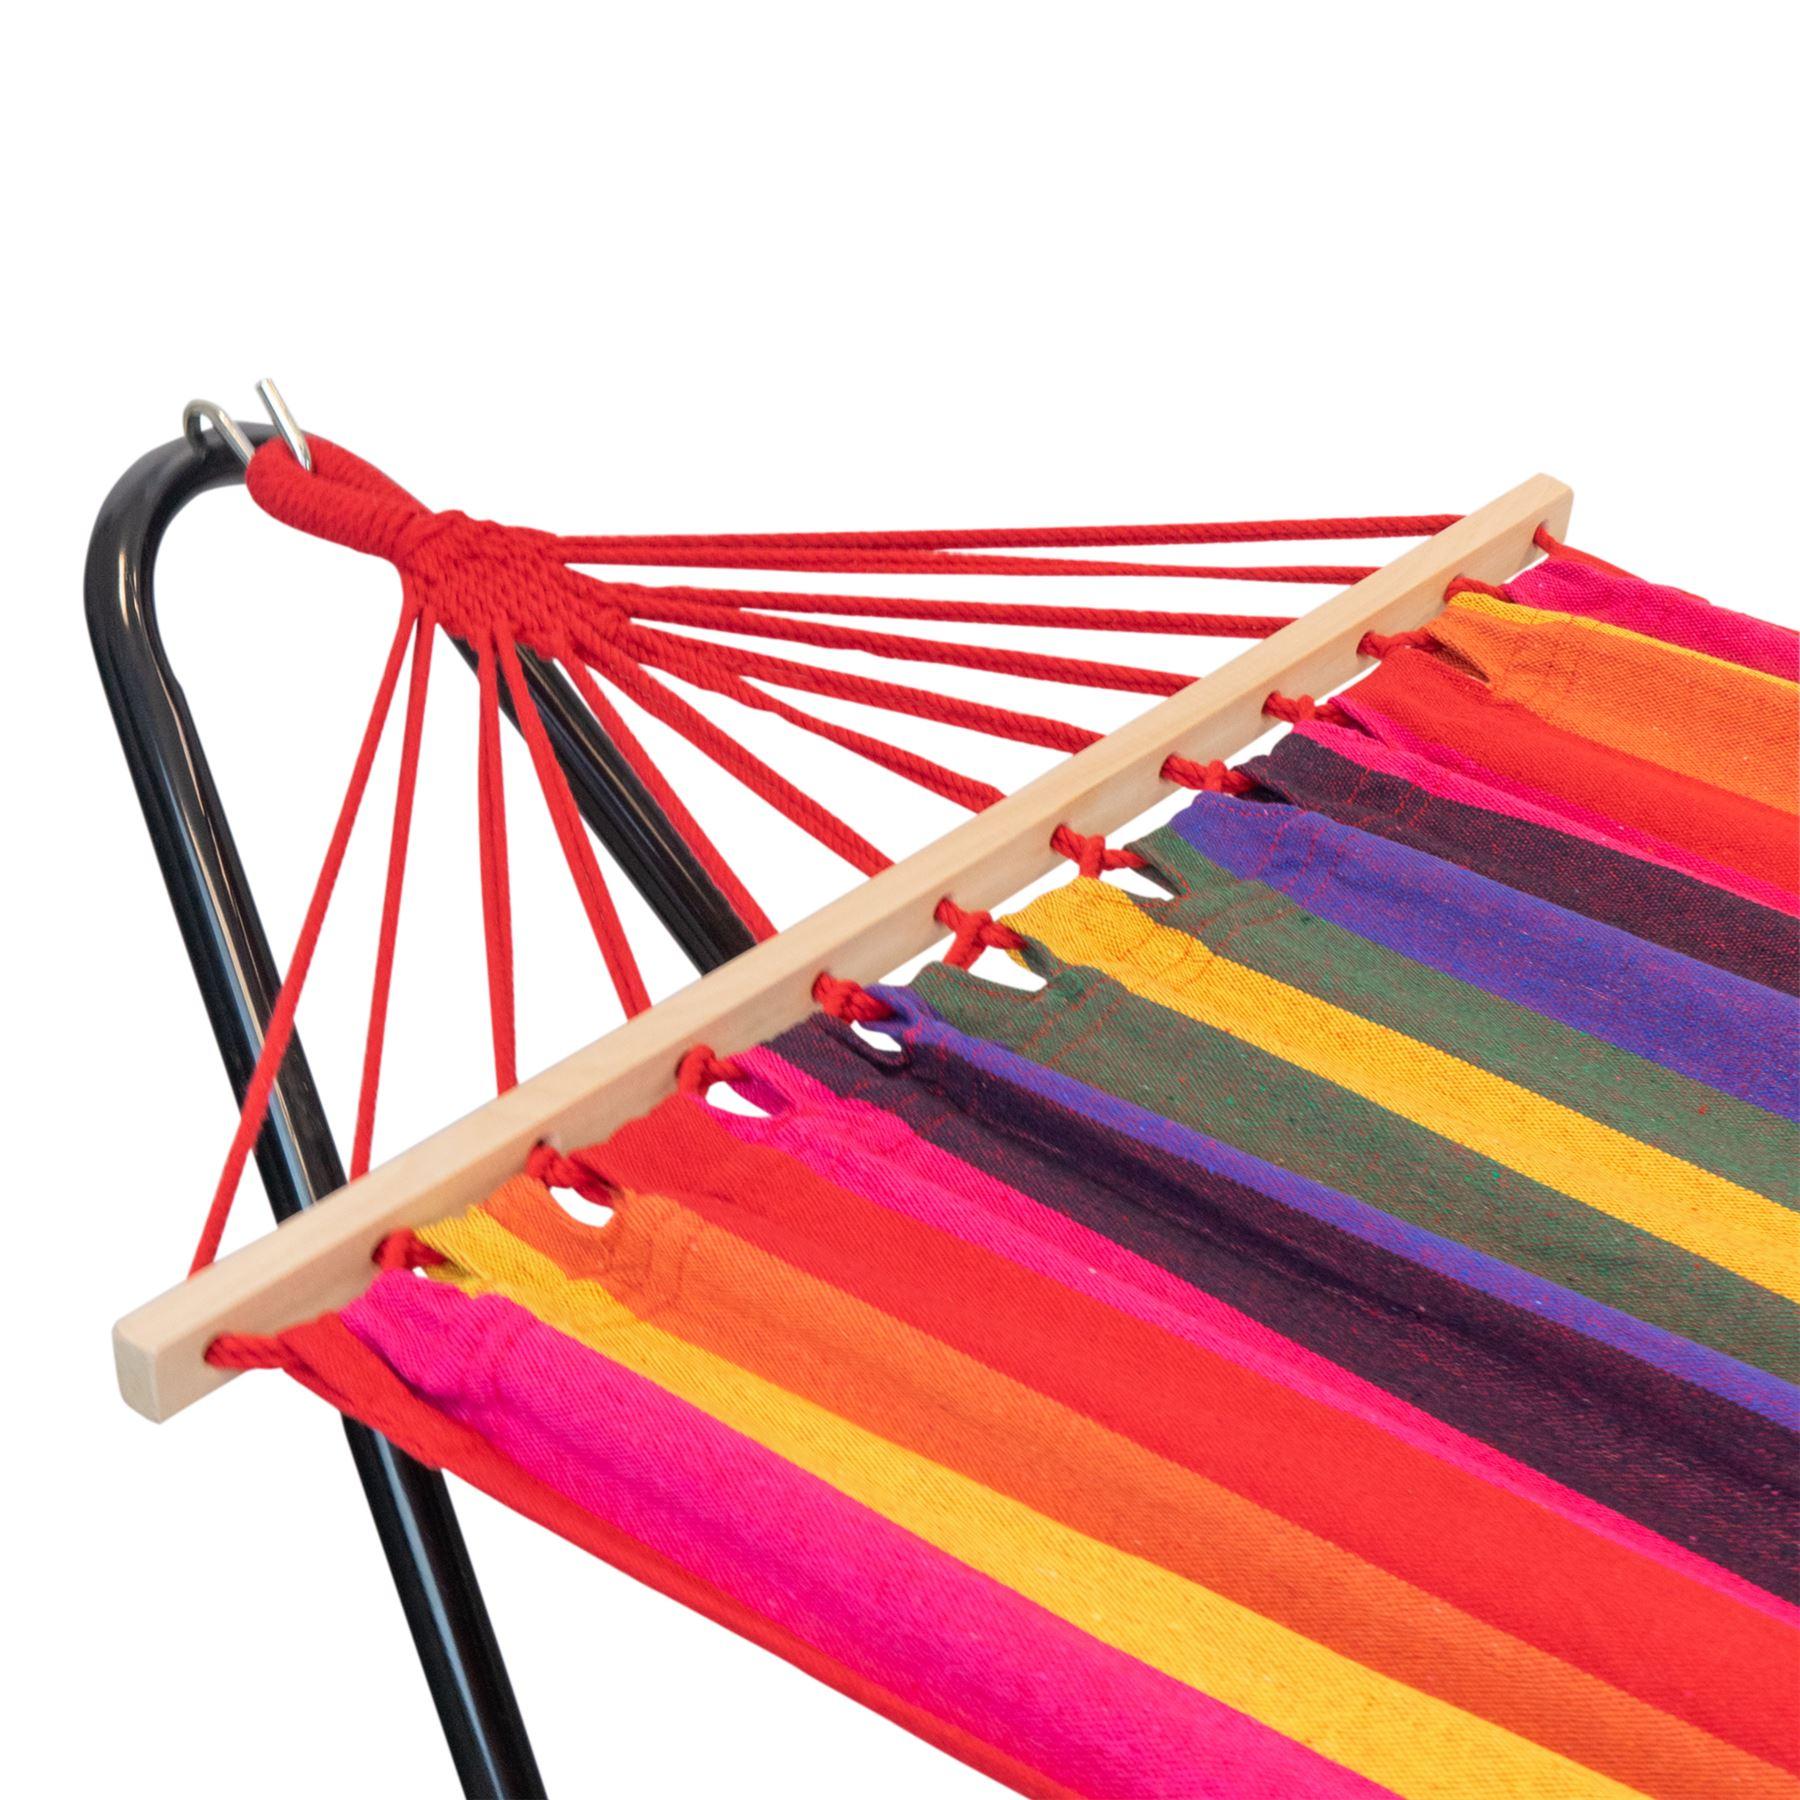 Ext rieur jardin br silien suspendu hamac avec support tissu de coton ebay - Hamac de jardin avec support ...